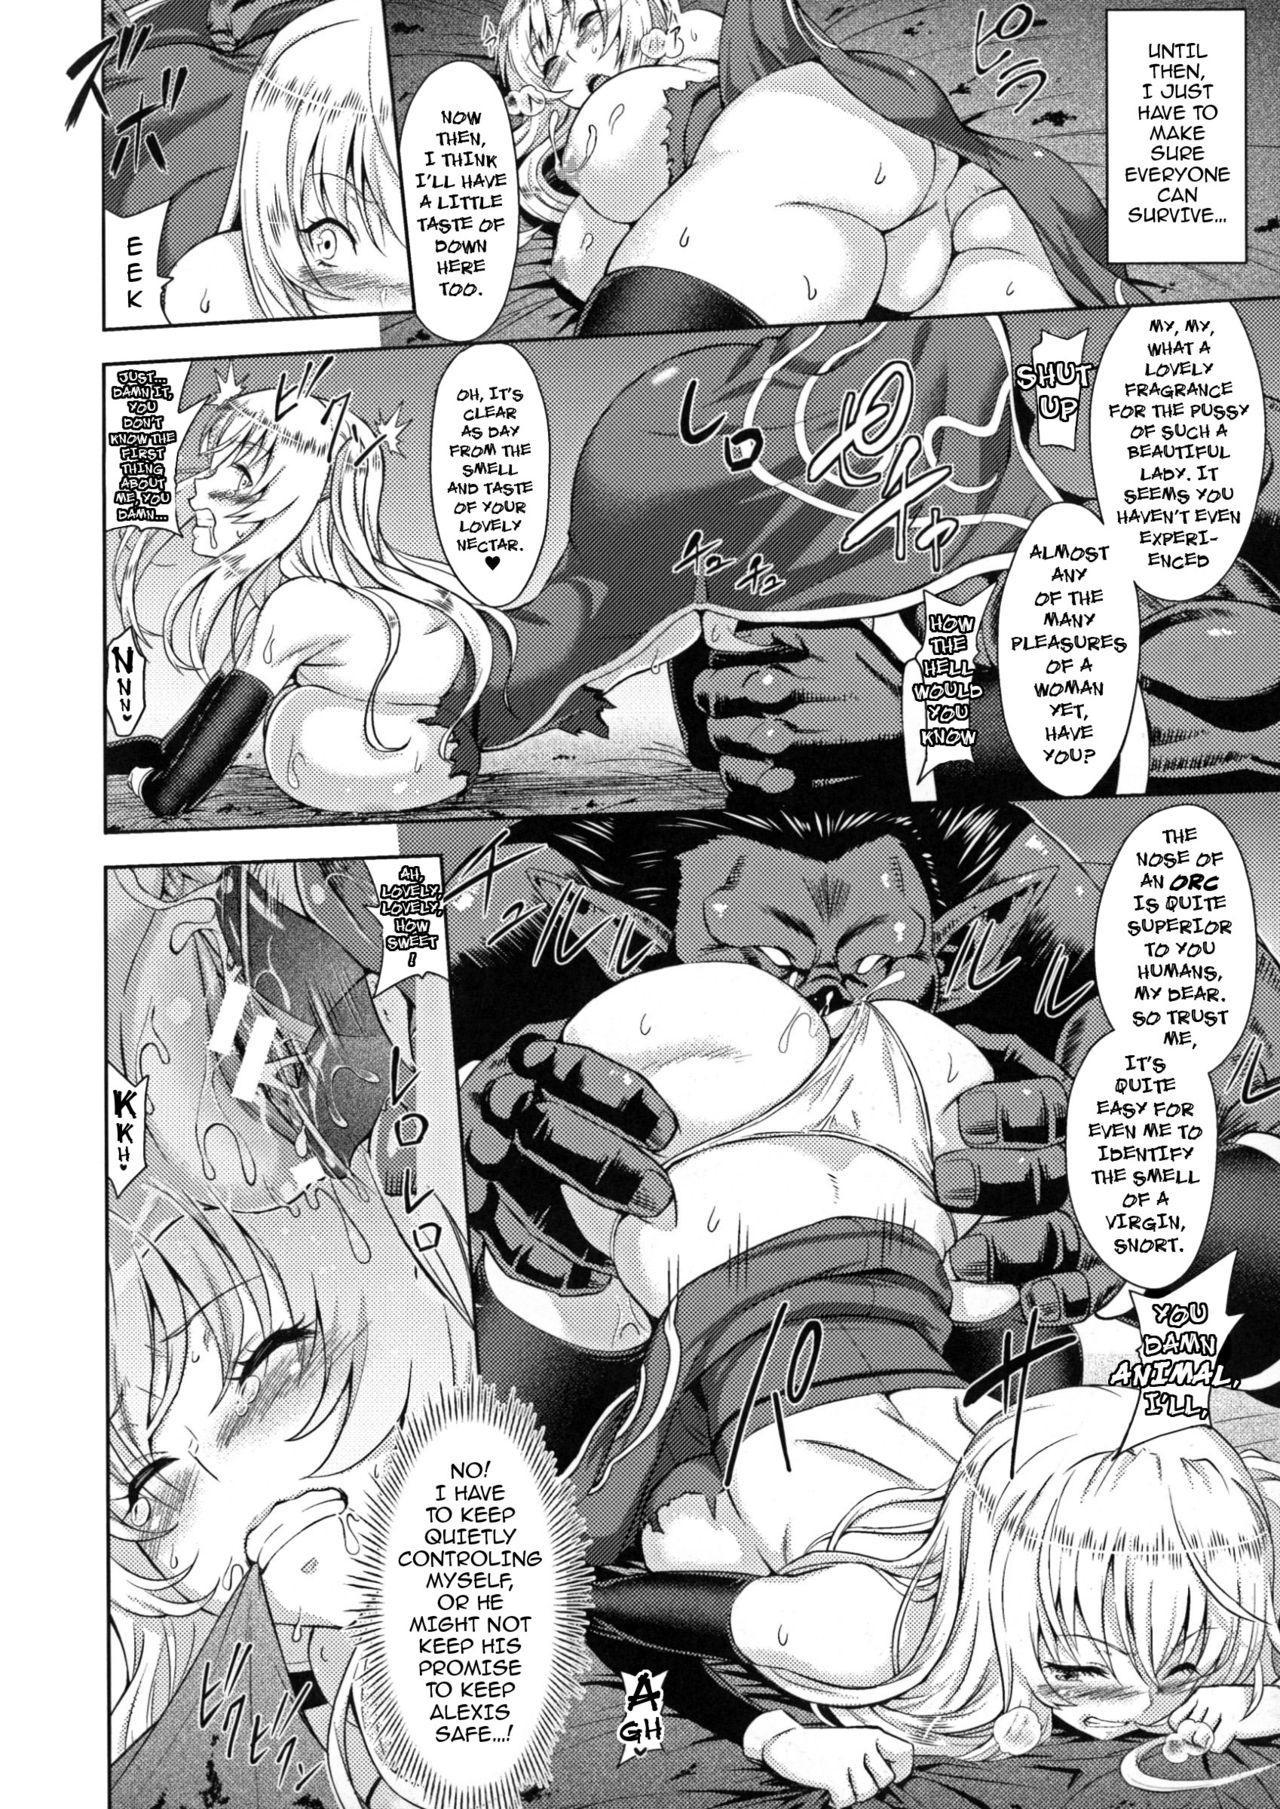 [Yamada Gogogo] Erona ~Orc no Inmon ni Okasareta Onna Kishi no Matsuro~ | Erona ~The Fall of a Beautiful Knight Cursed with the Lewd Mark of an Orc~ [English] {darknight} 14